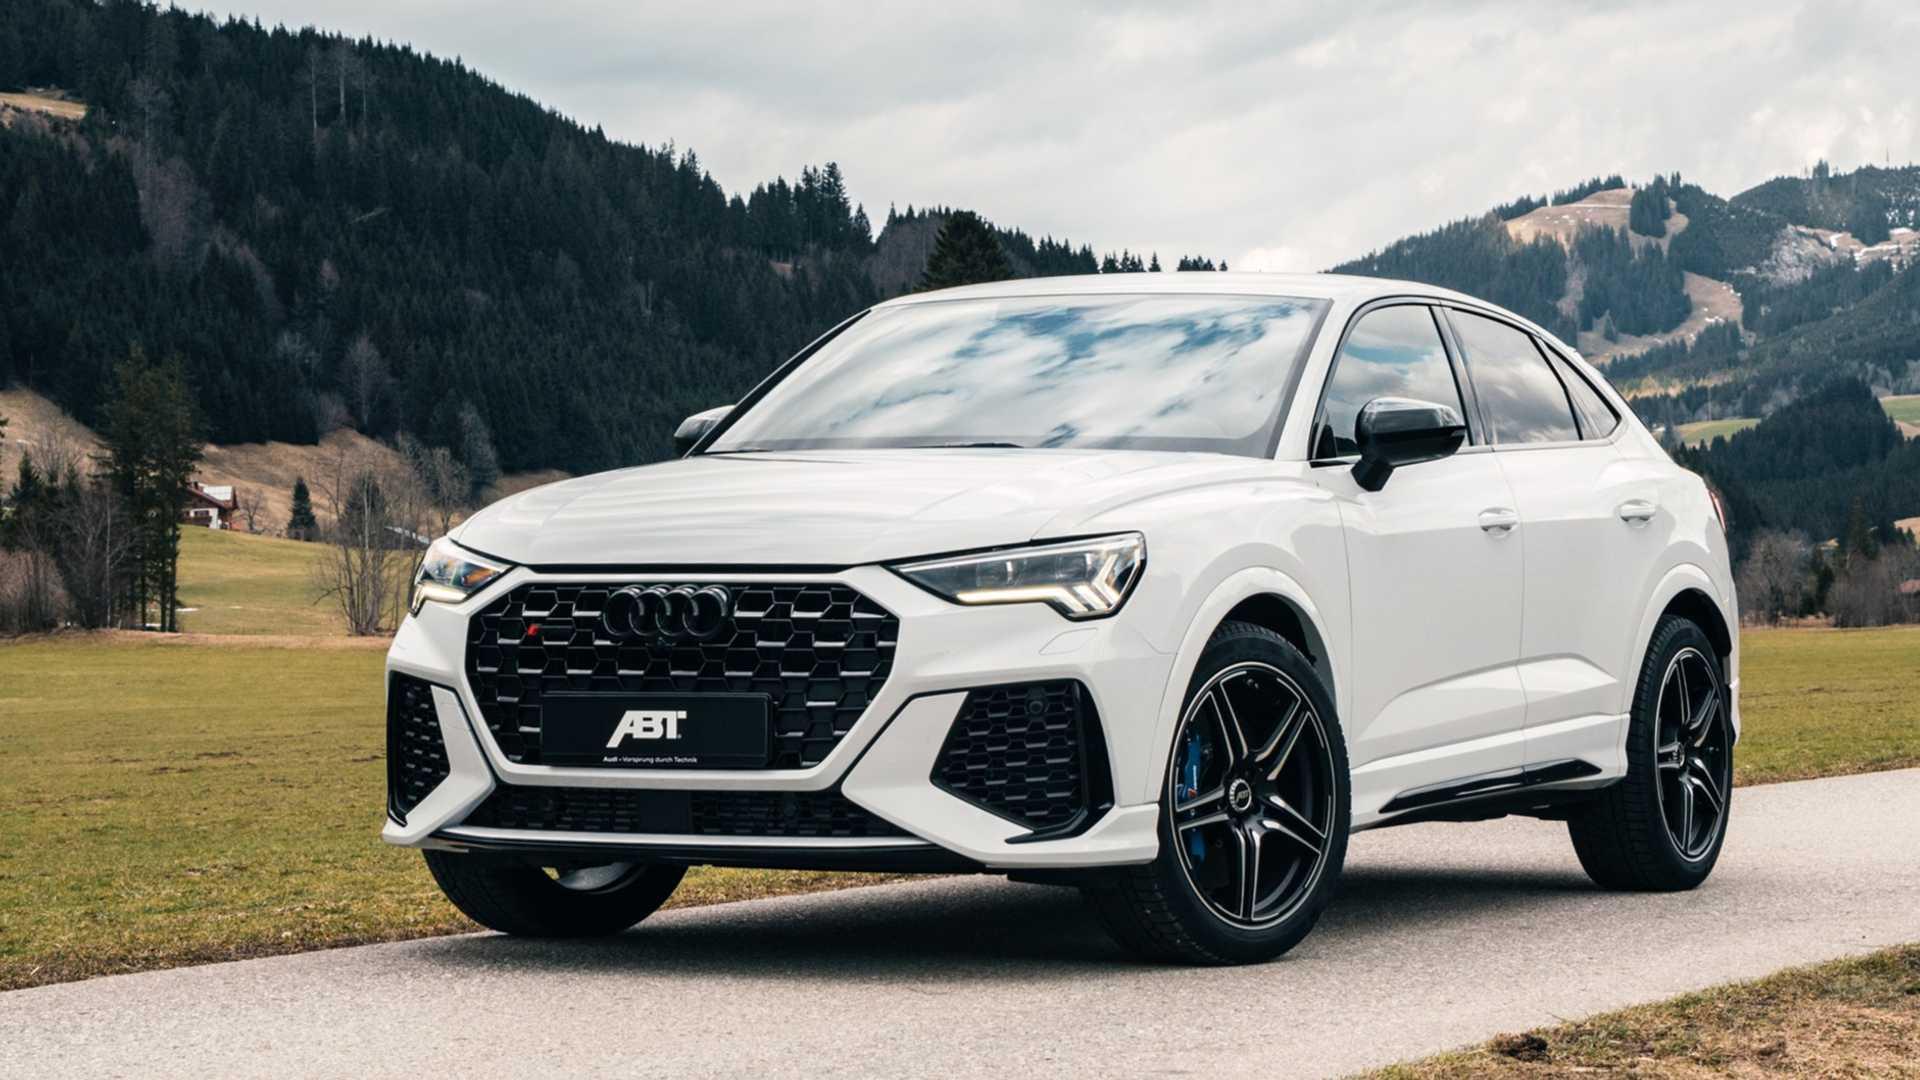 Audi-RS-Q3-Sportback-by-ABT-1